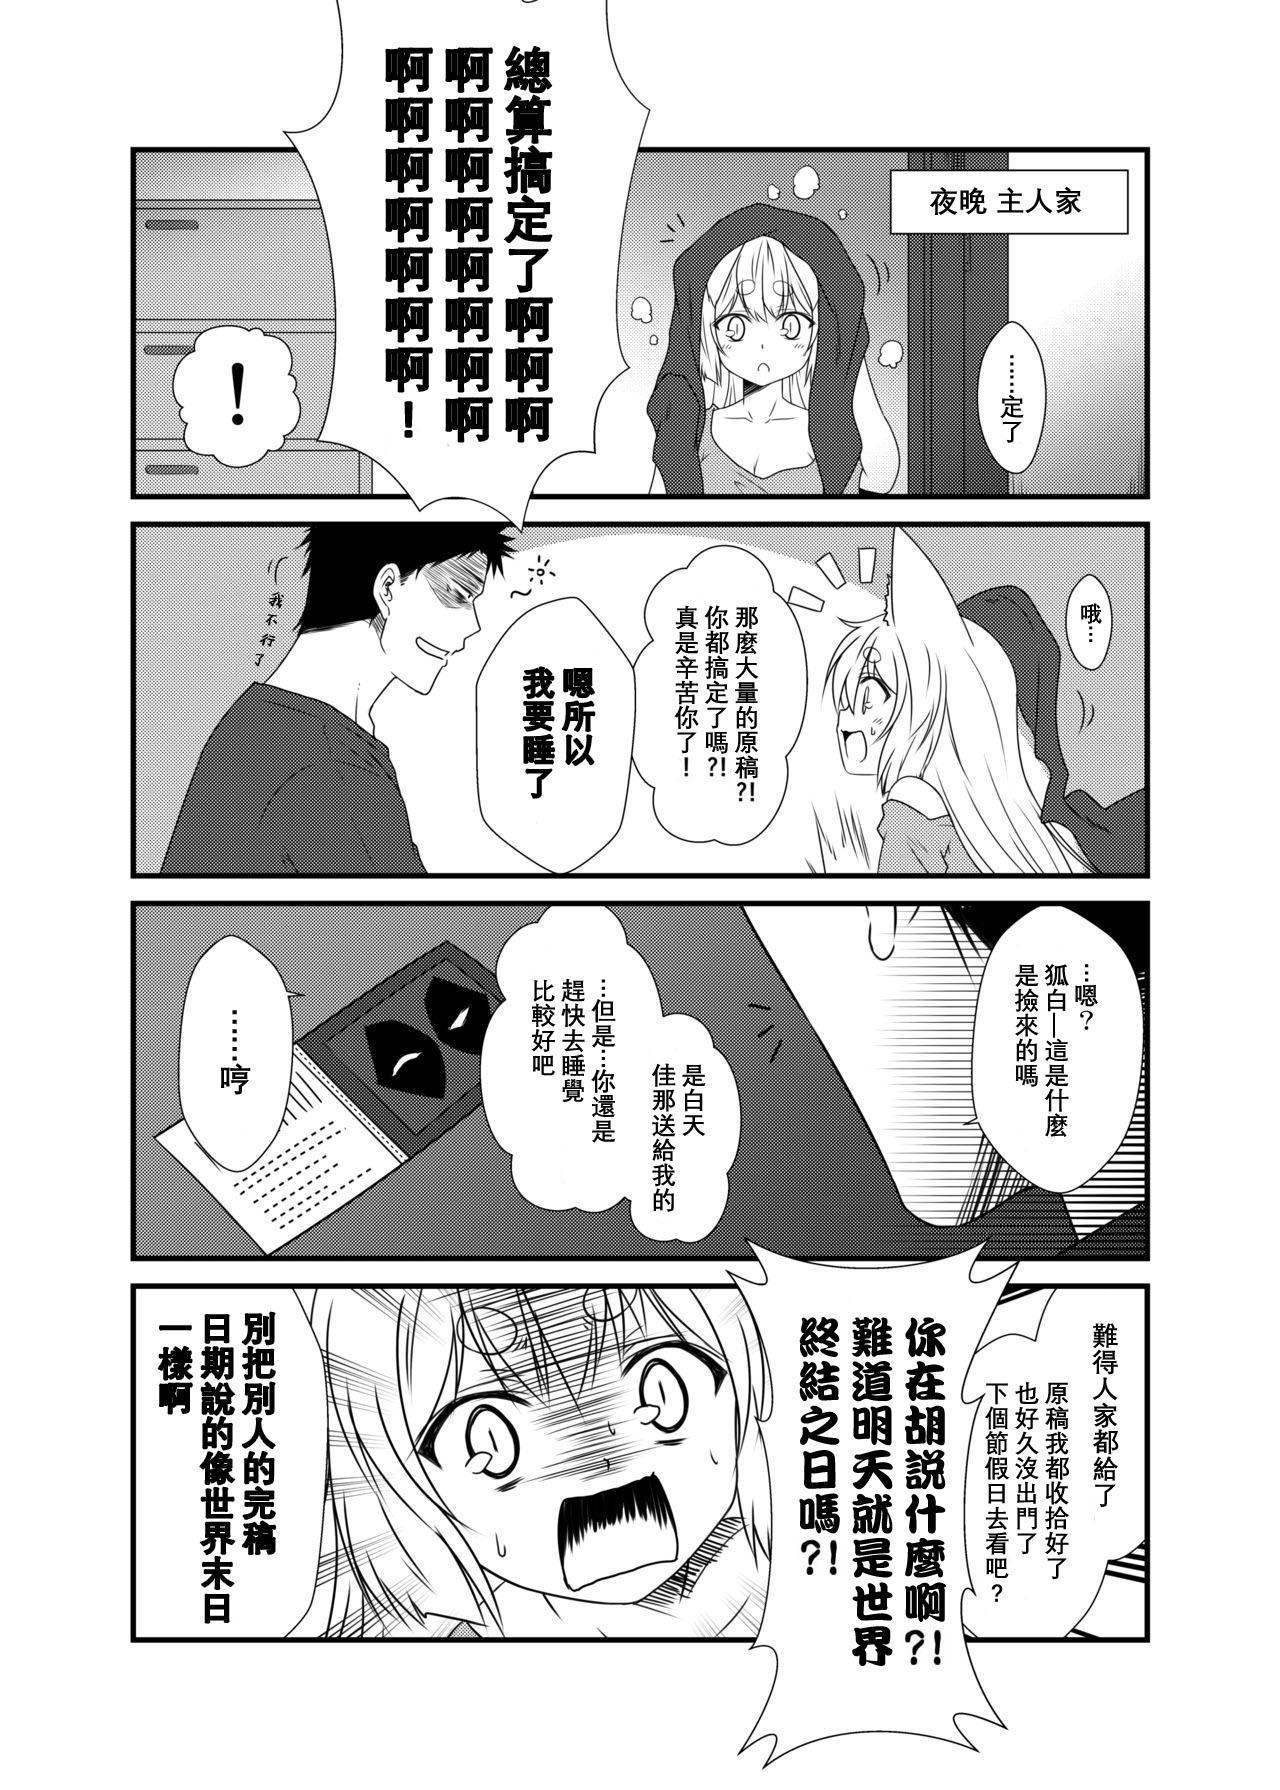 Kohaku Biyori Vol. 5 7